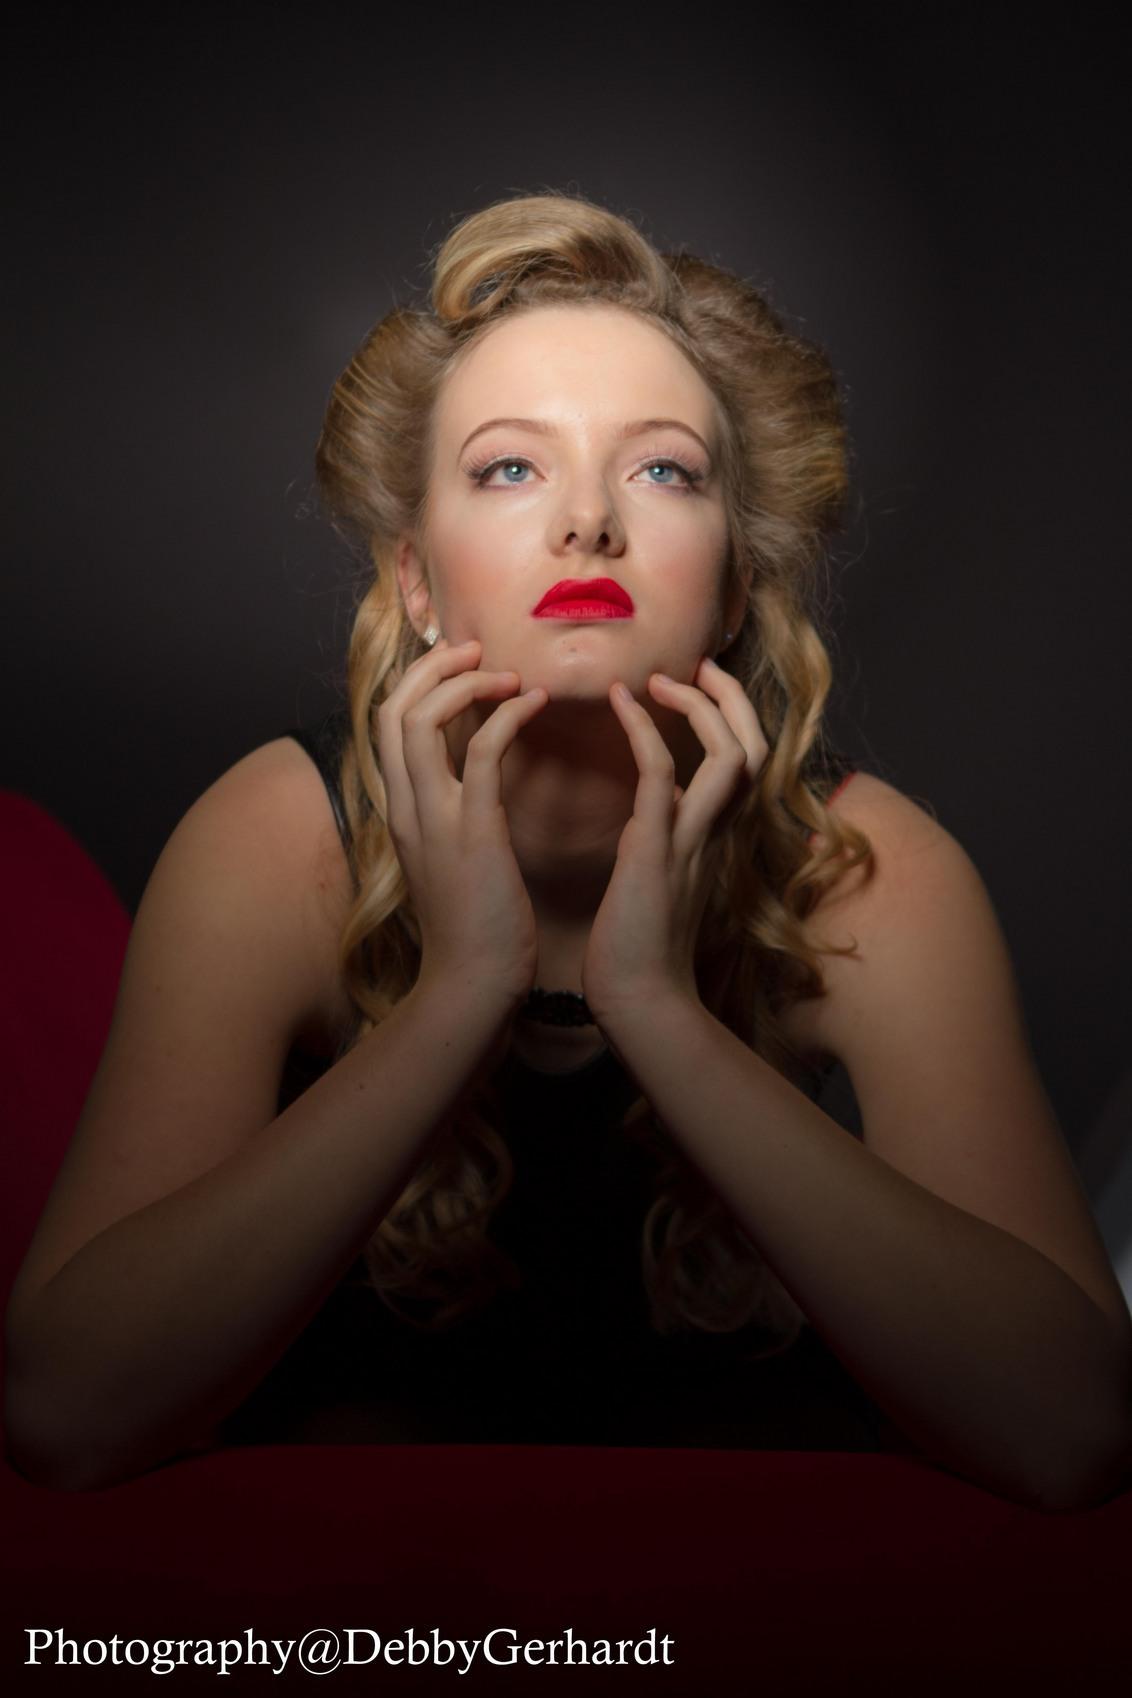 Renske - Klassieke lichtsetup Hollywoodstyle - foto door debbyvroon op 22-01-2015 - deze foto bevat: mensen, donker, licht, portret, model, flits, ogen, haar, meisje, beauty, glamour, studio, blond, closeup, fotoshoot, visagie, flitser